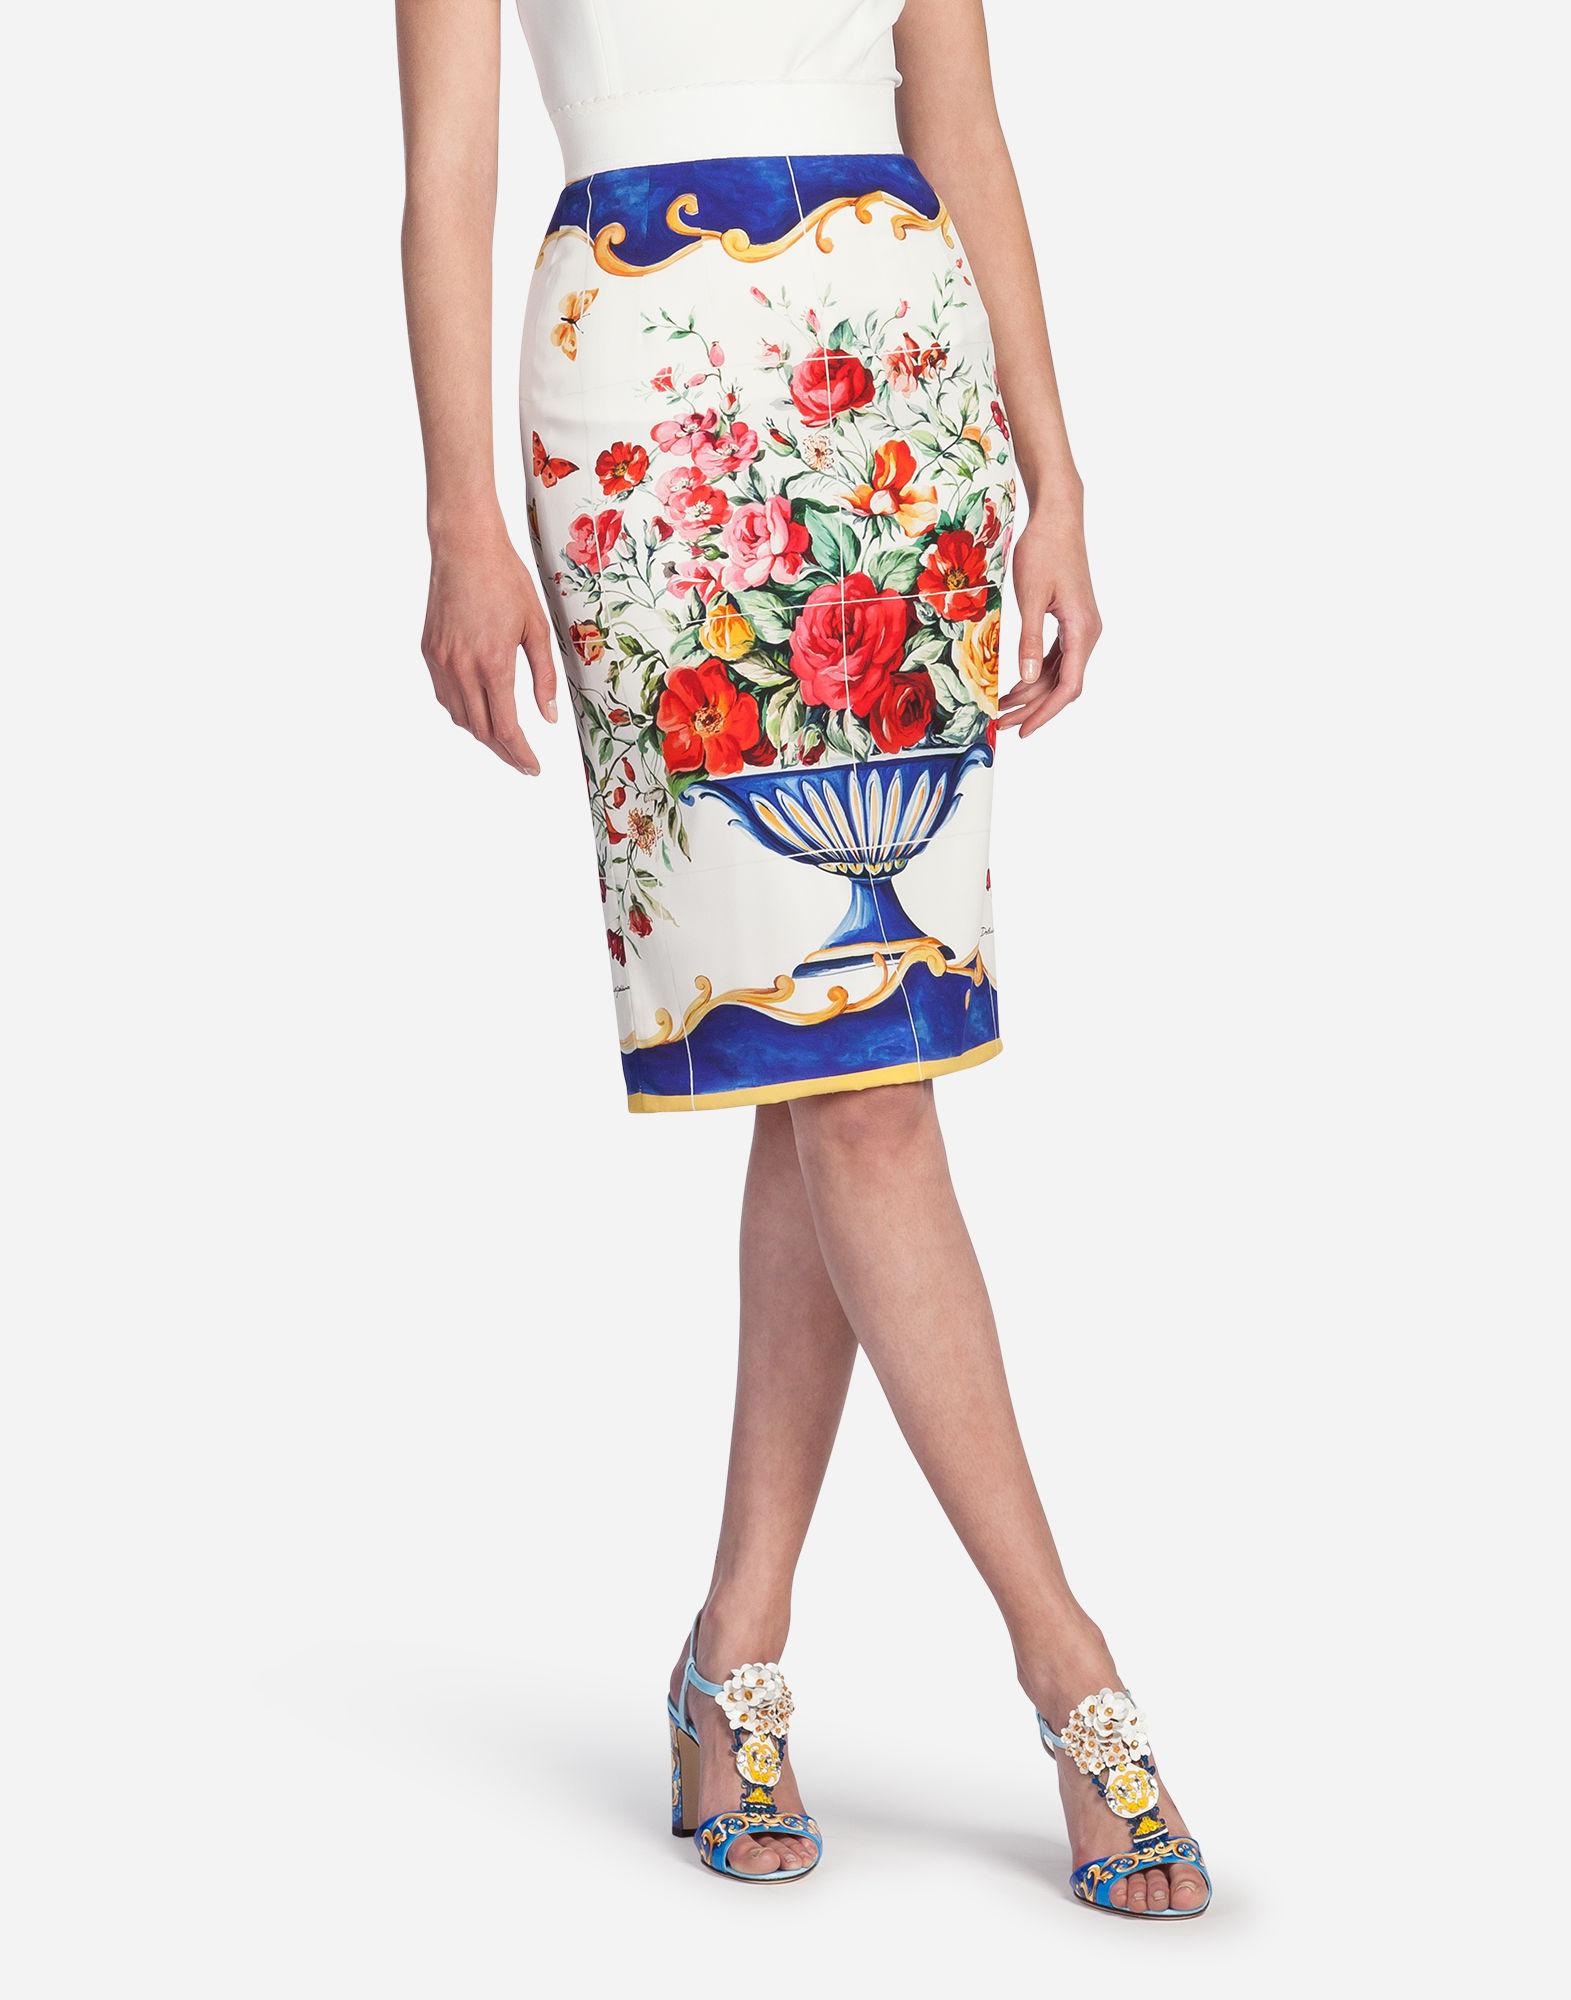 Dolce & Gabbana Caltagirone Print Pencil Skirt In Multicolor